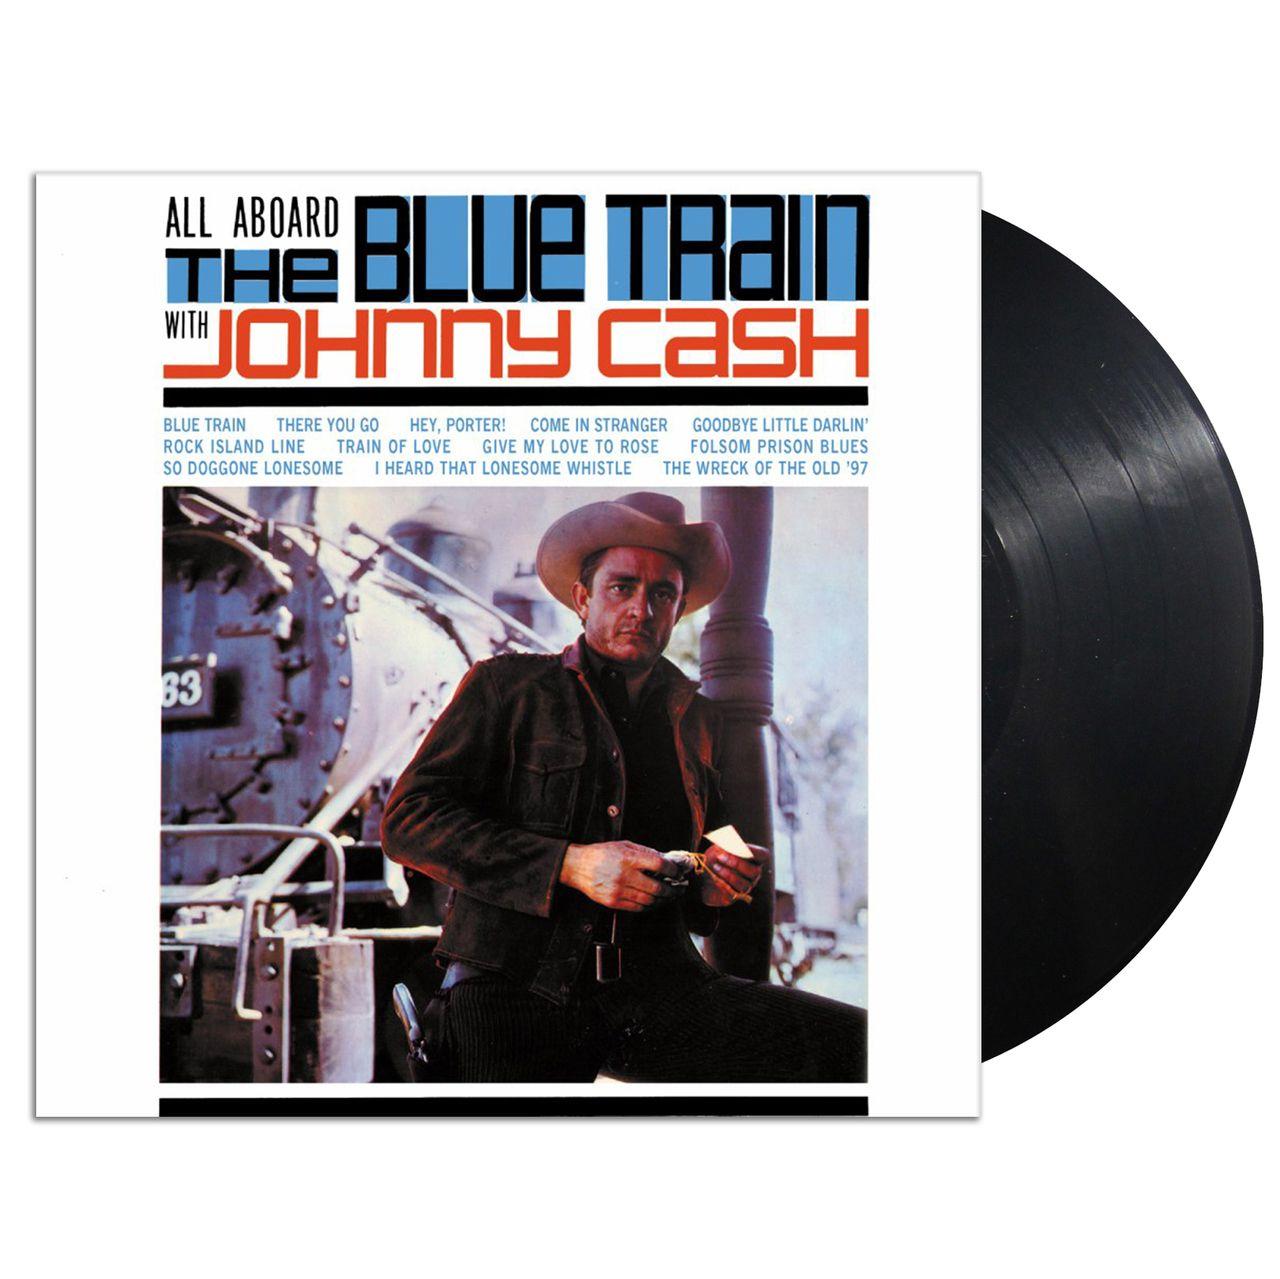 Lazy Labrador Records Johnny Cash All Aboard The Blue Train With Johnny Cash Vinyl Lp Black 22 99 Http La Johnny Cash Vinyl Blue Train Johnny Cash